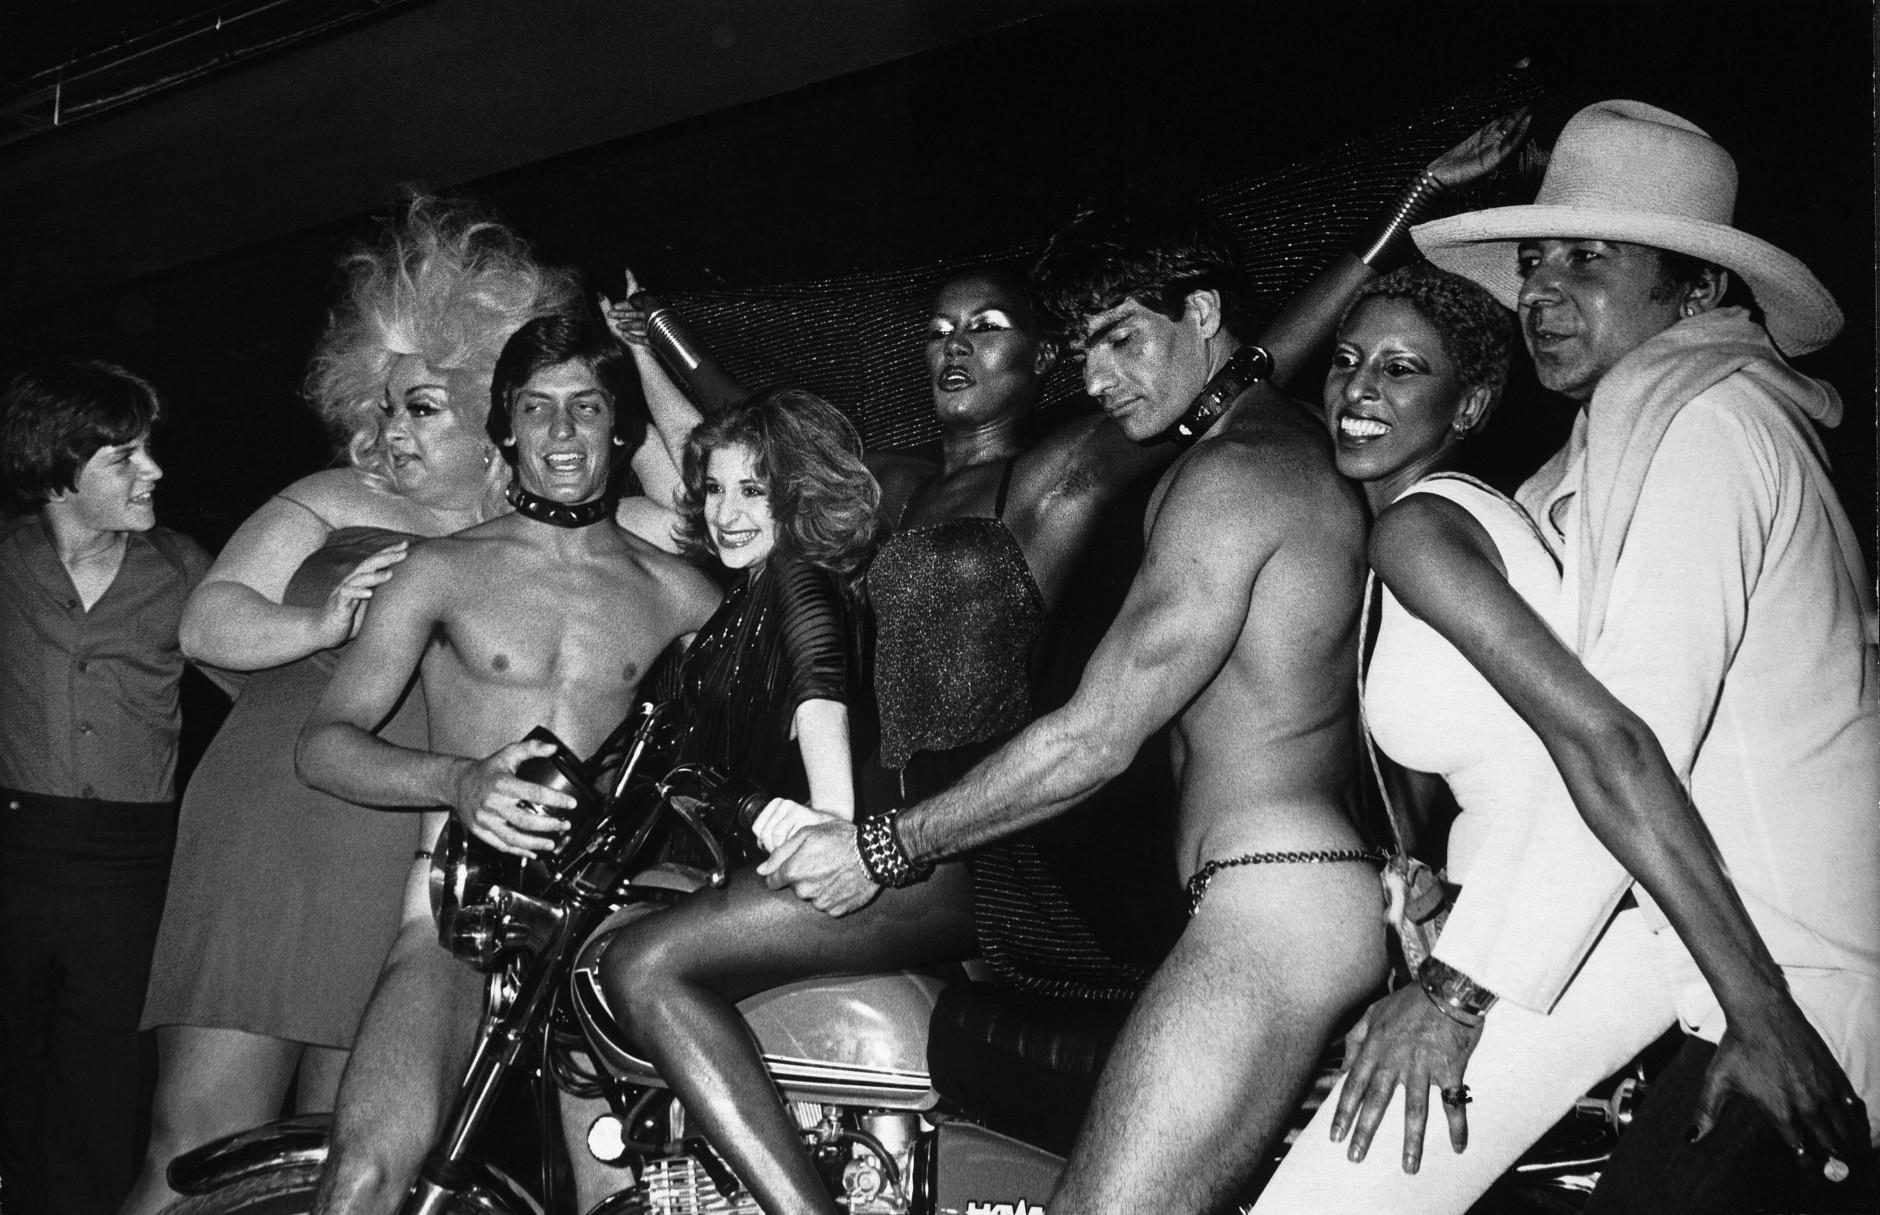 Francesco Scavullo: Grace Jones, 1979. © Francesco Scavullo, Motion Picture Group Inc.